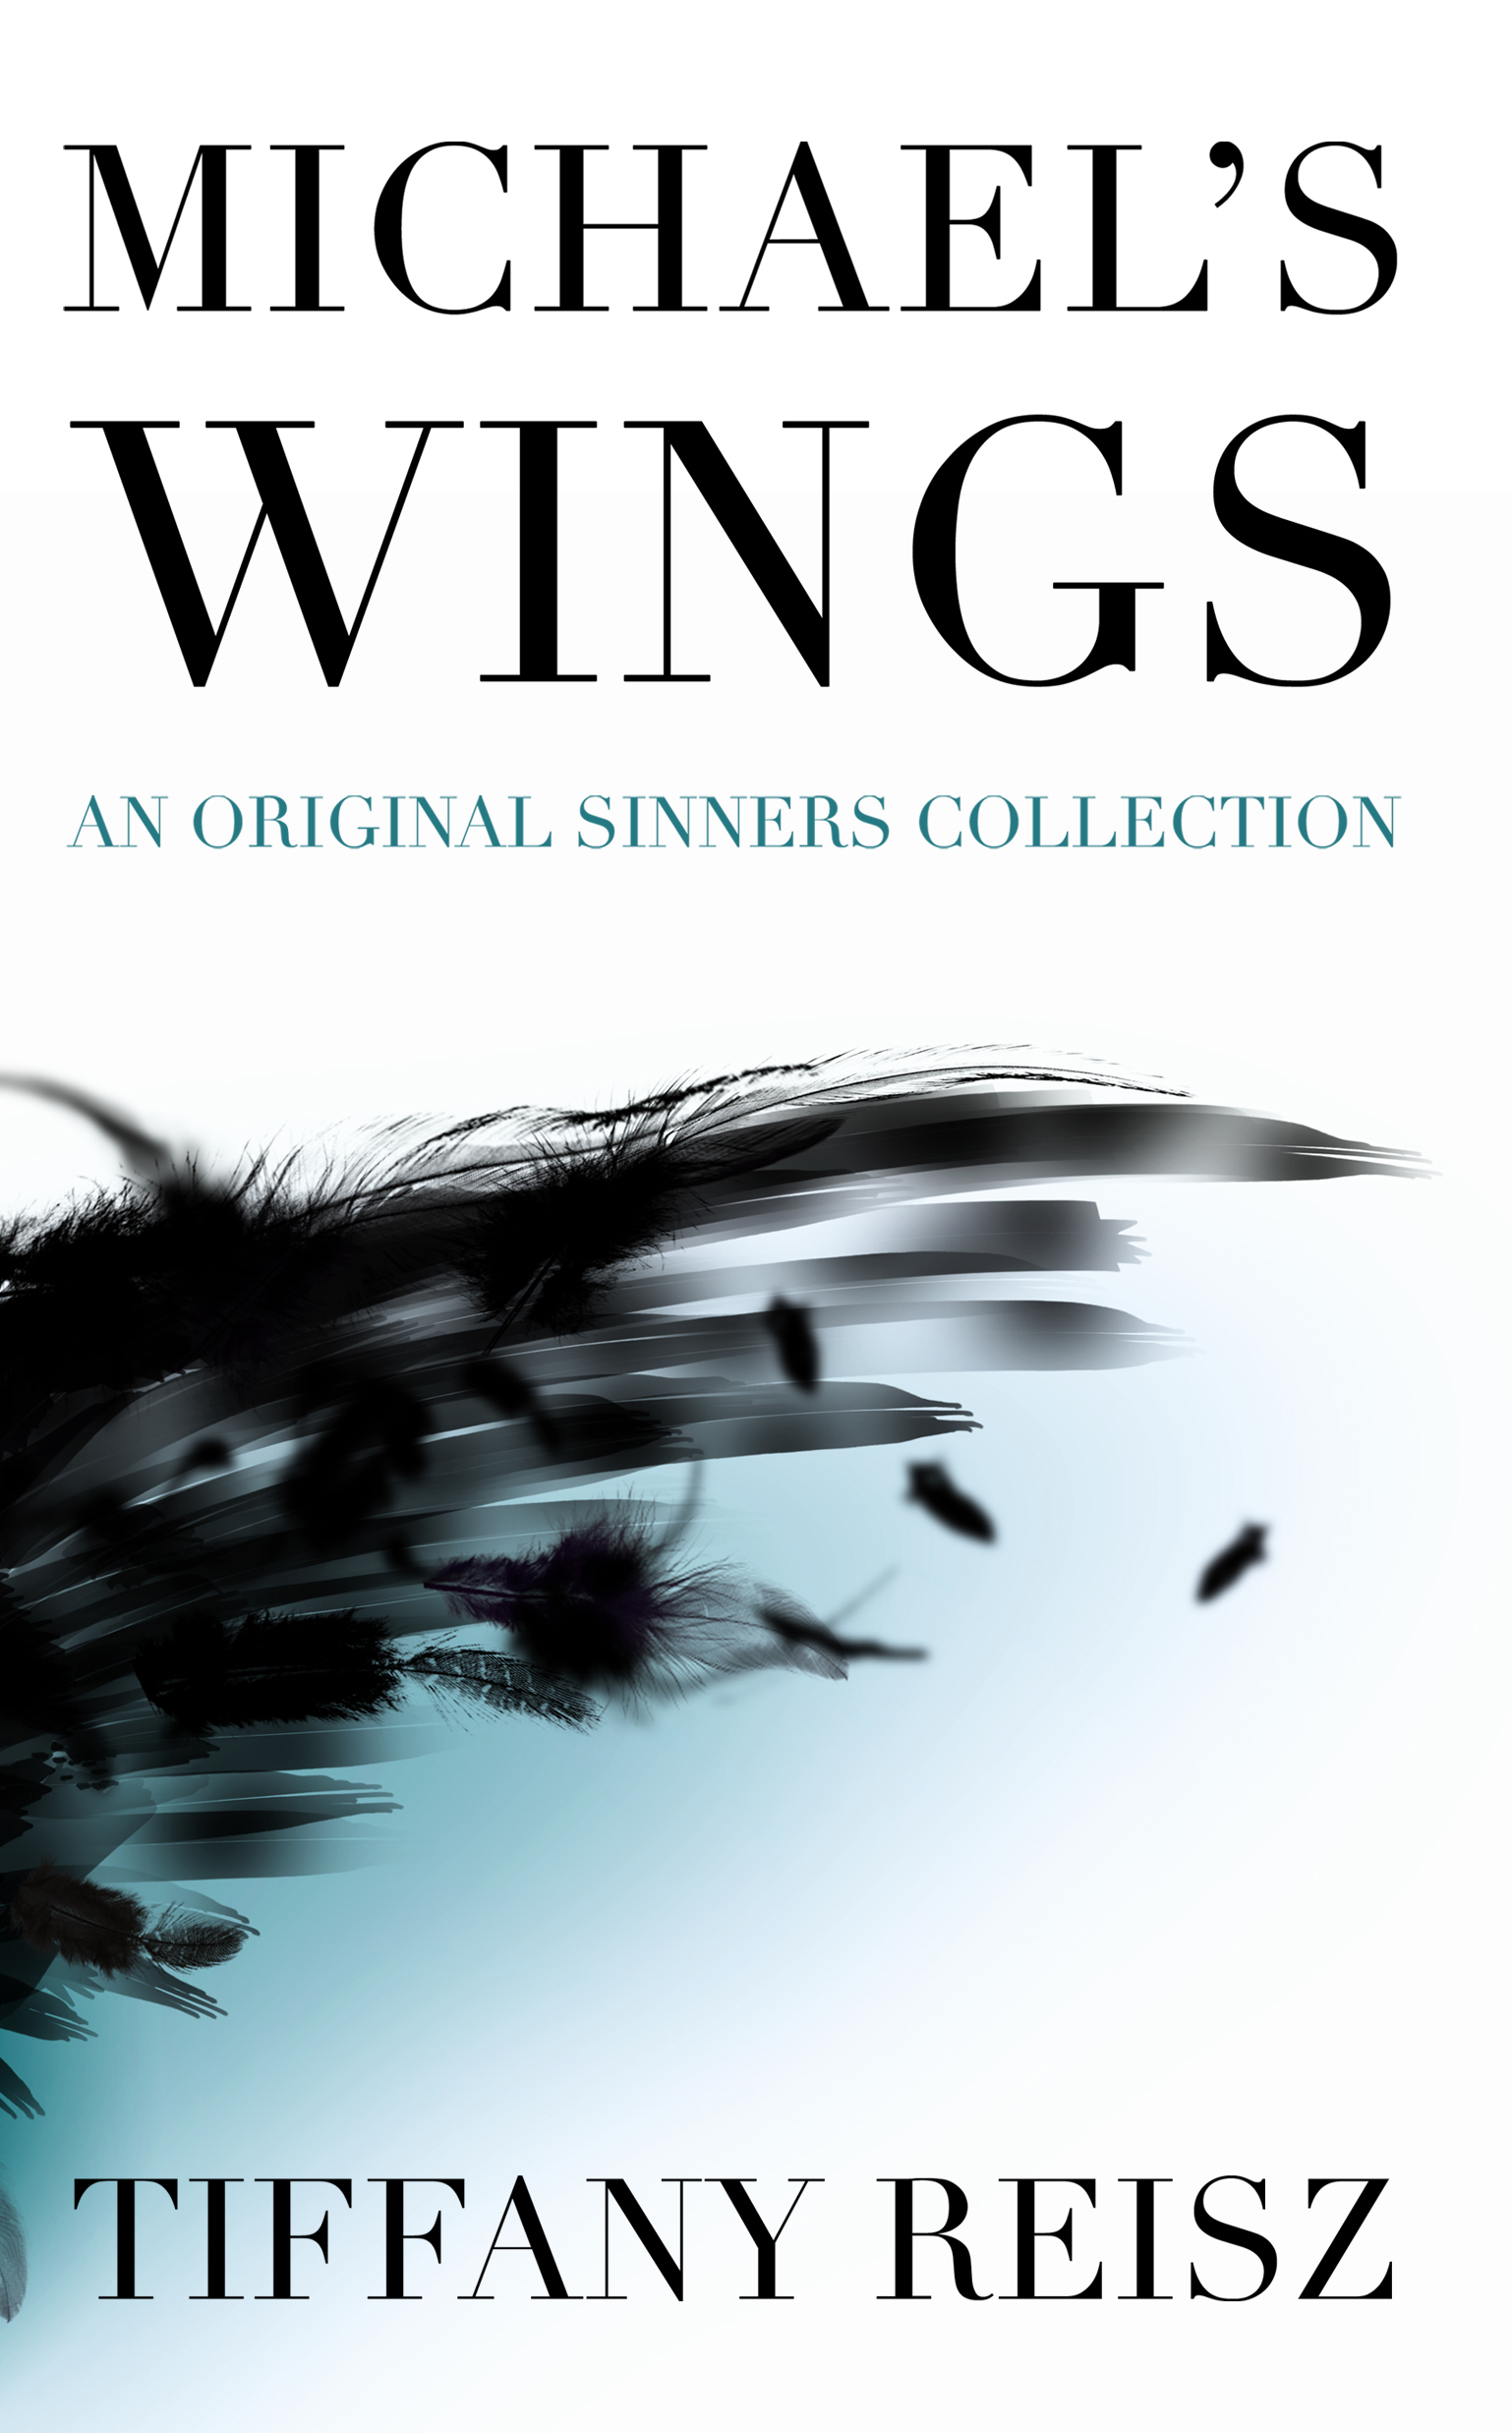 michaelswings-cover-print.jpg